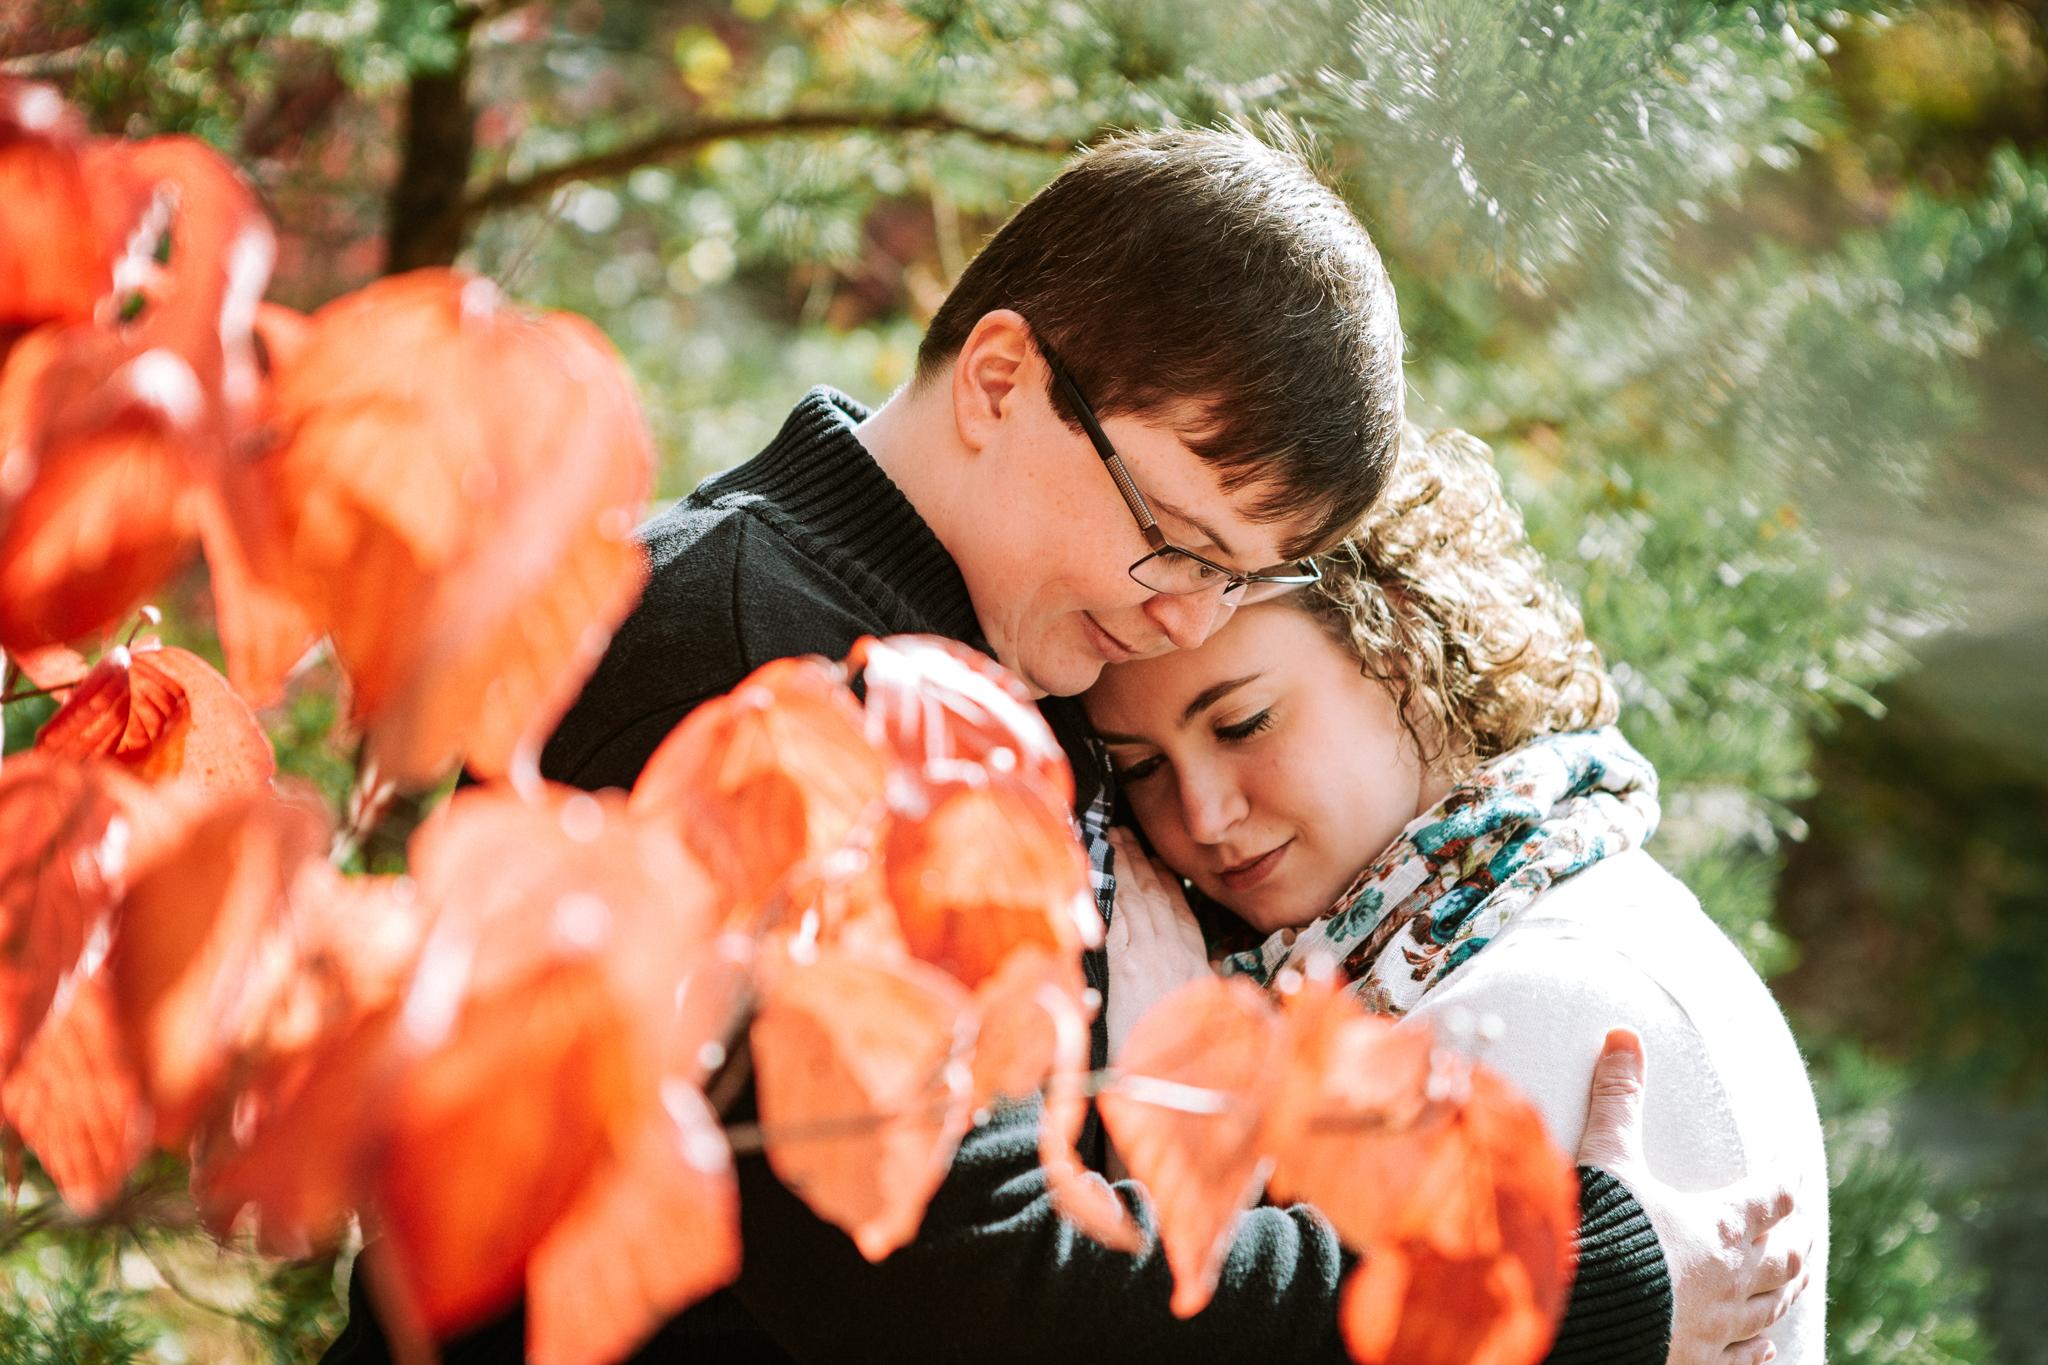 Richmond Kentucky Engagement Photographer - Ariana Jordan Photography -29.jpg